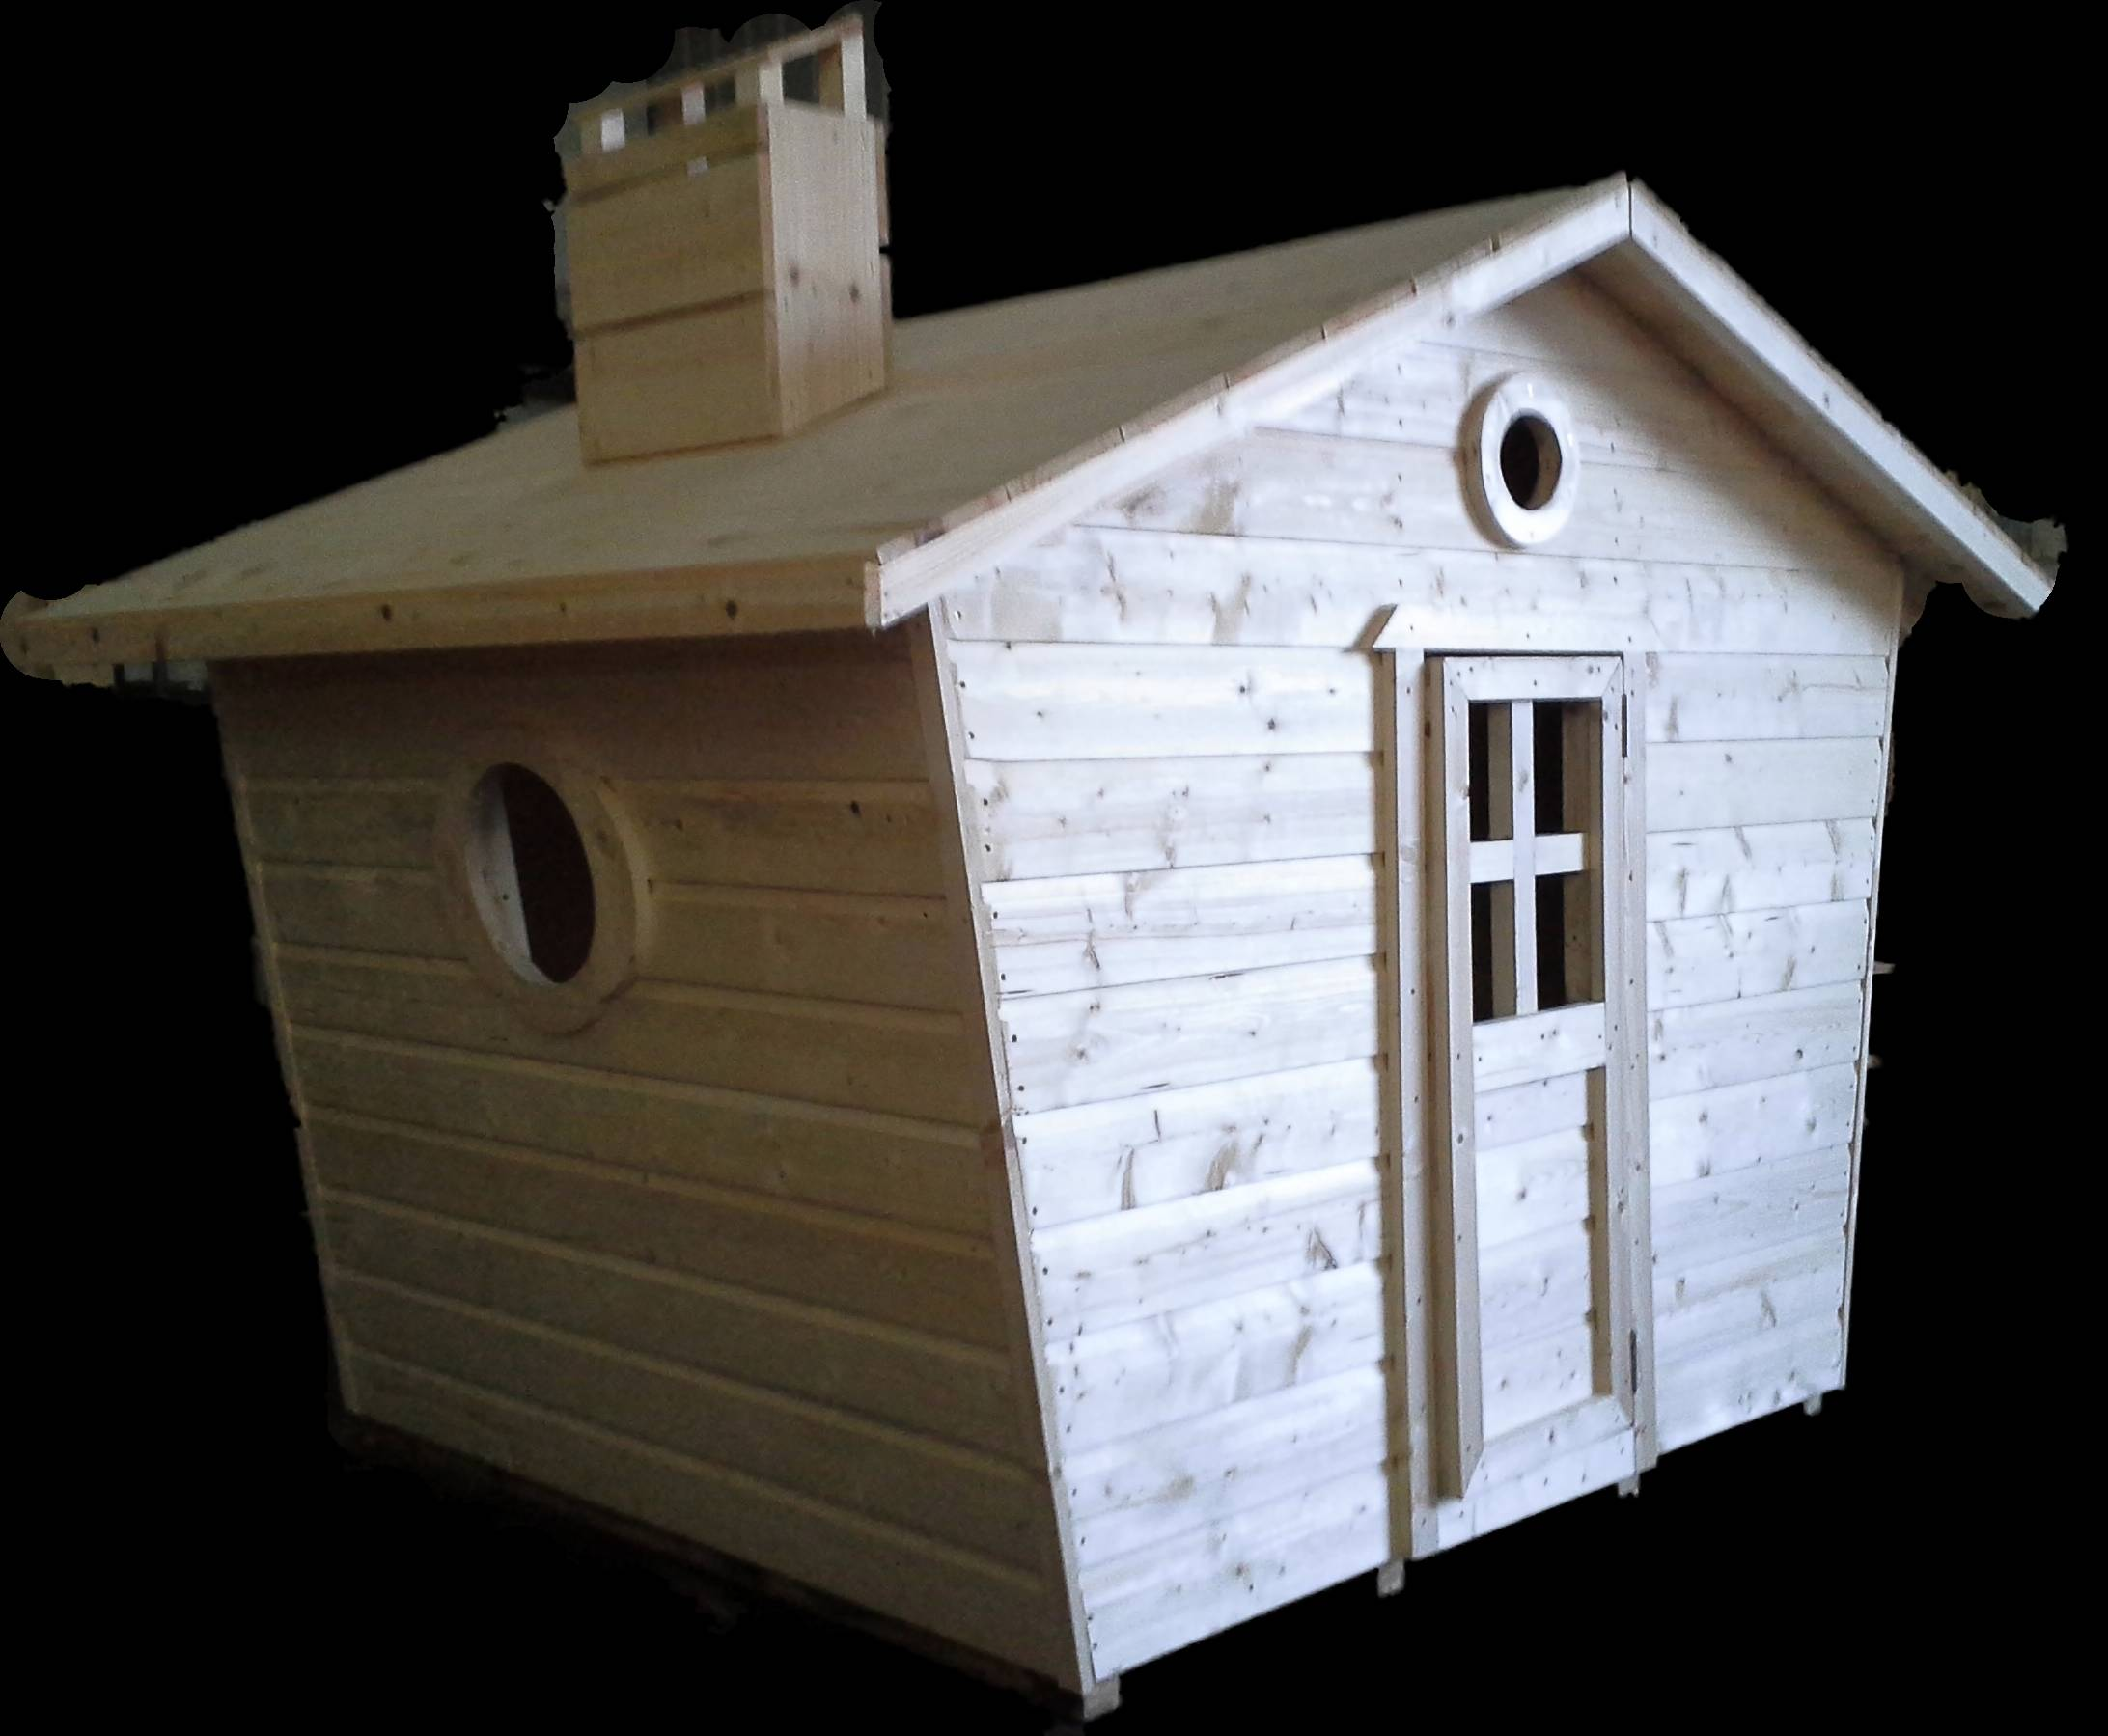 Fancy Wooden Playhouse (5' x 5')